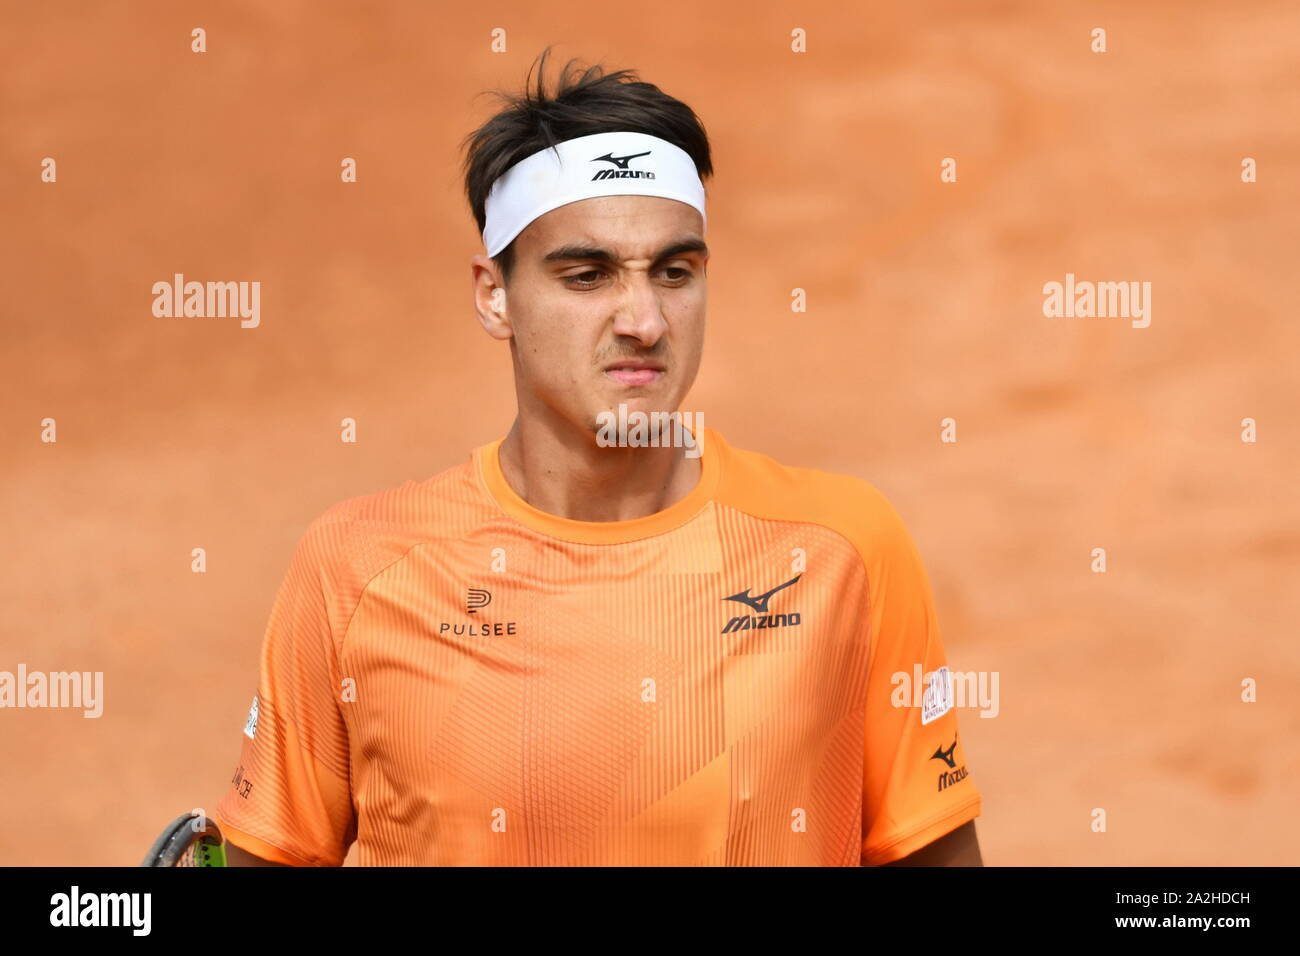 Lorenzo en Roma sonego Internazionali Bnl 2019 , Roma, Italia, 13 de mayo de 2019, Tenis Tenis TENIS Internationals Foto de stock